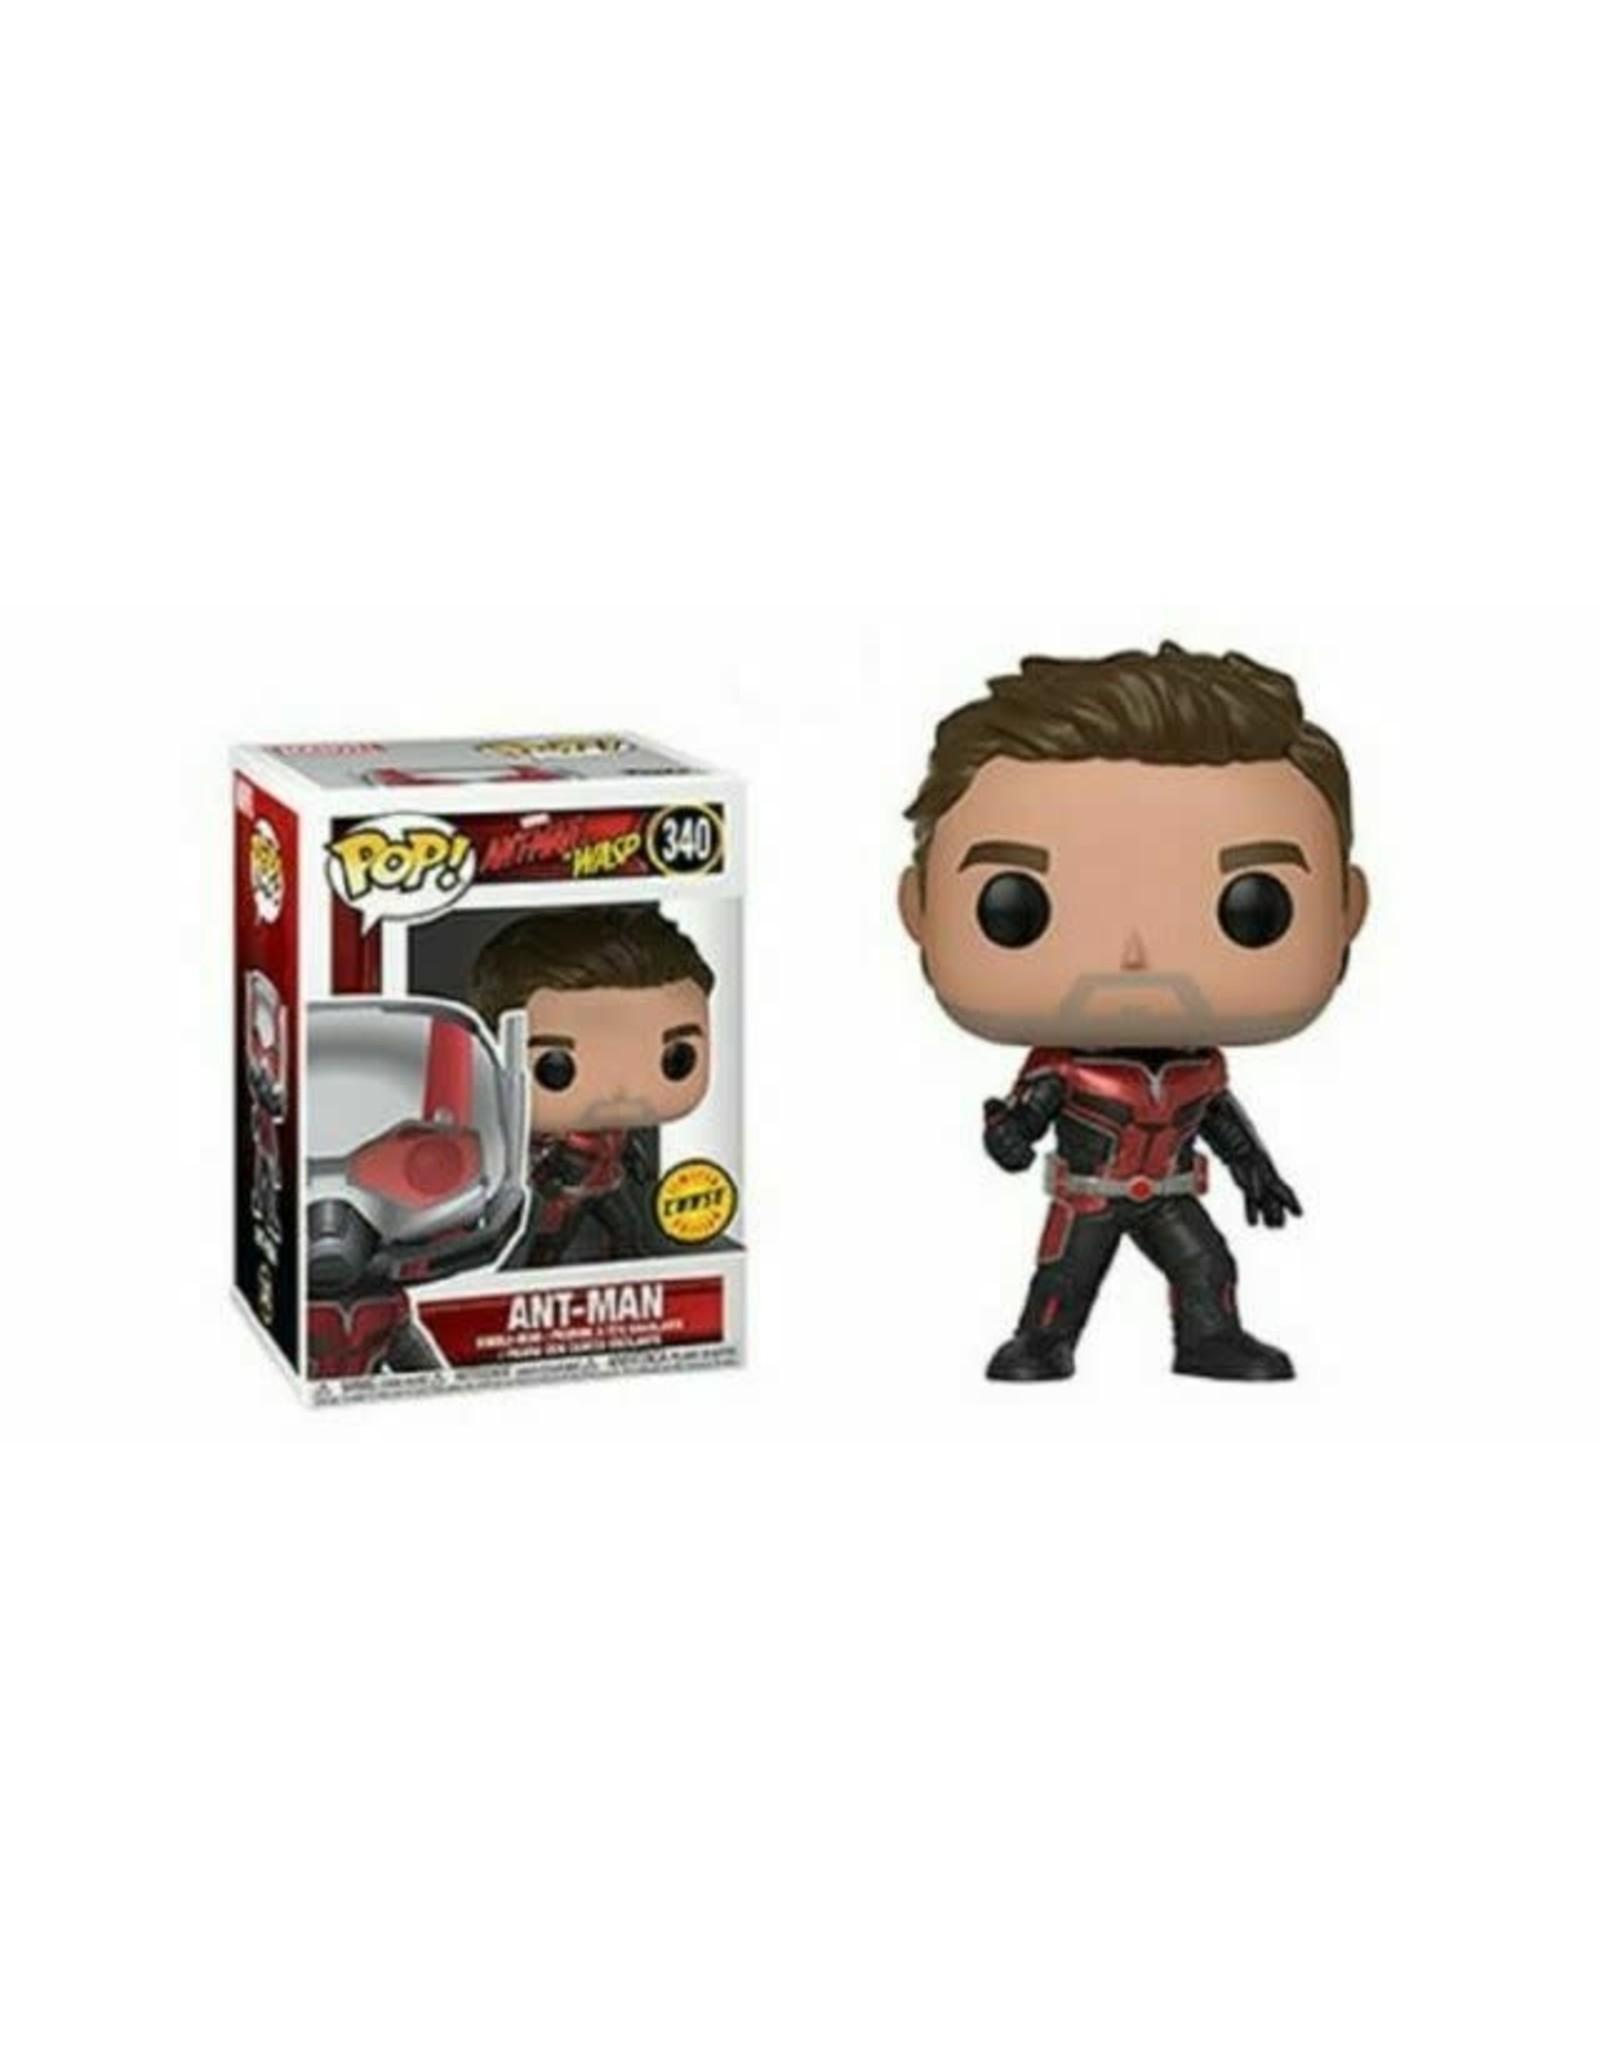 MARVEL - Bobble Head POP N° 340 - Ant-man : Ant-Man CHASE